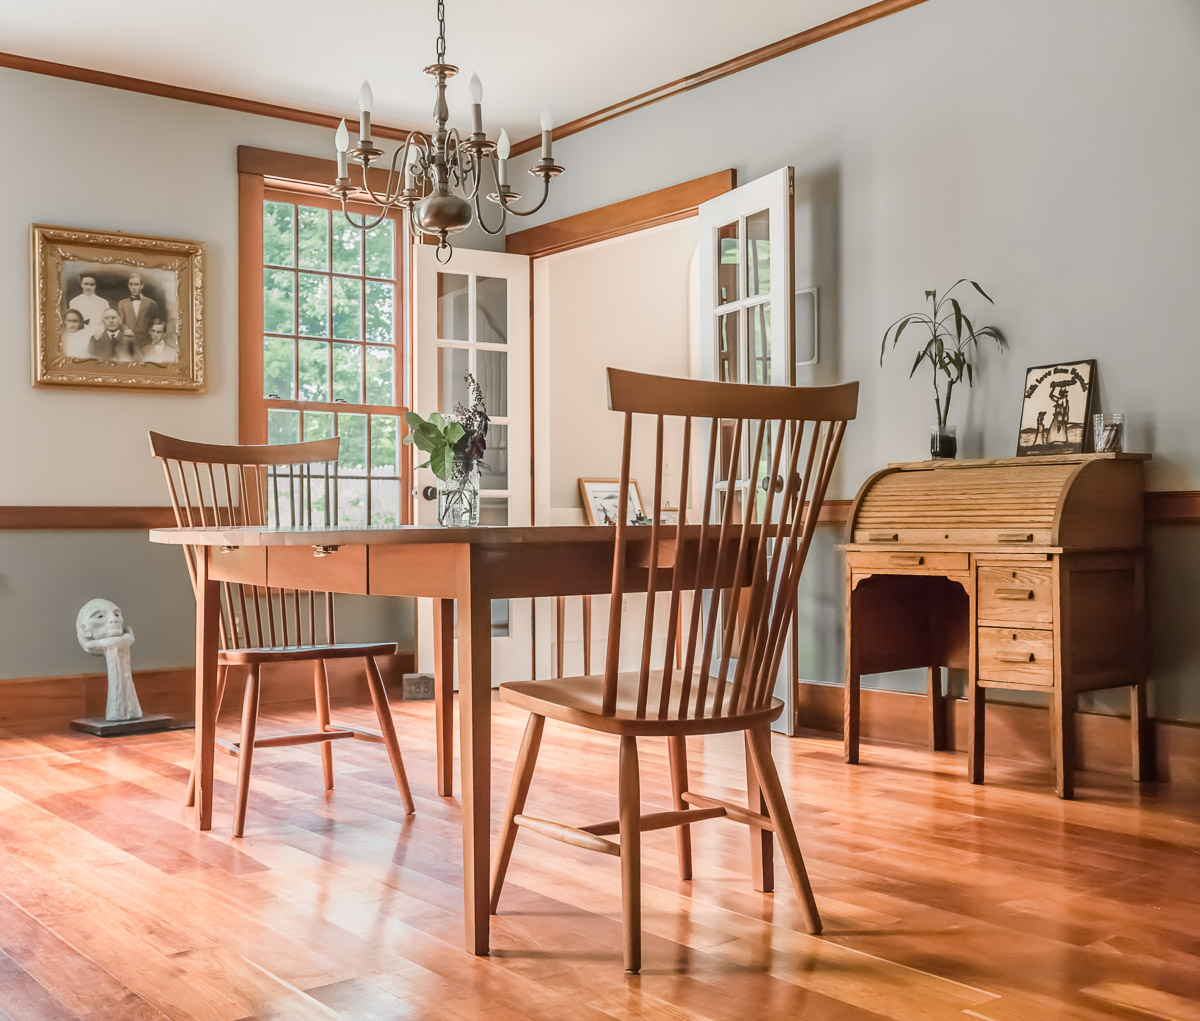 dining-room-country-cherry-hardwood-thomas-moser.jpg